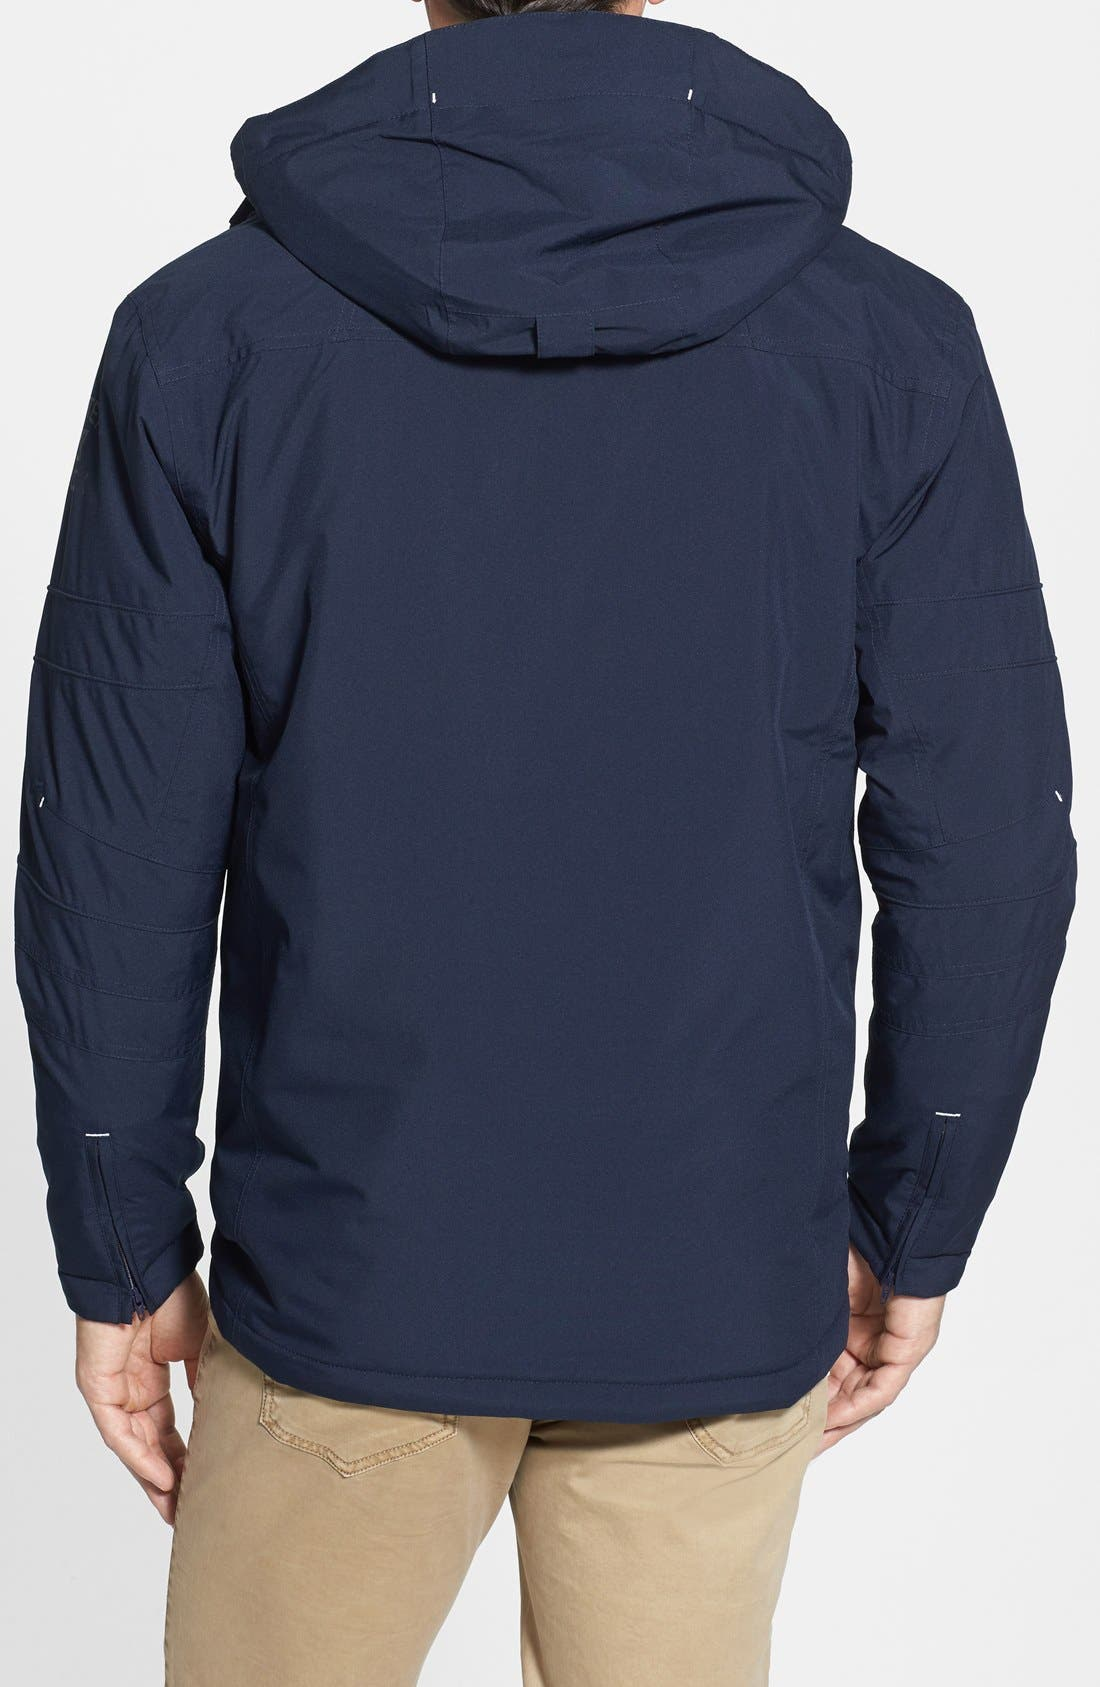 CUTTER & BUCK,                             WeatherTec Sanders Jacket,                             Alternate thumbnail 2, color,                             420